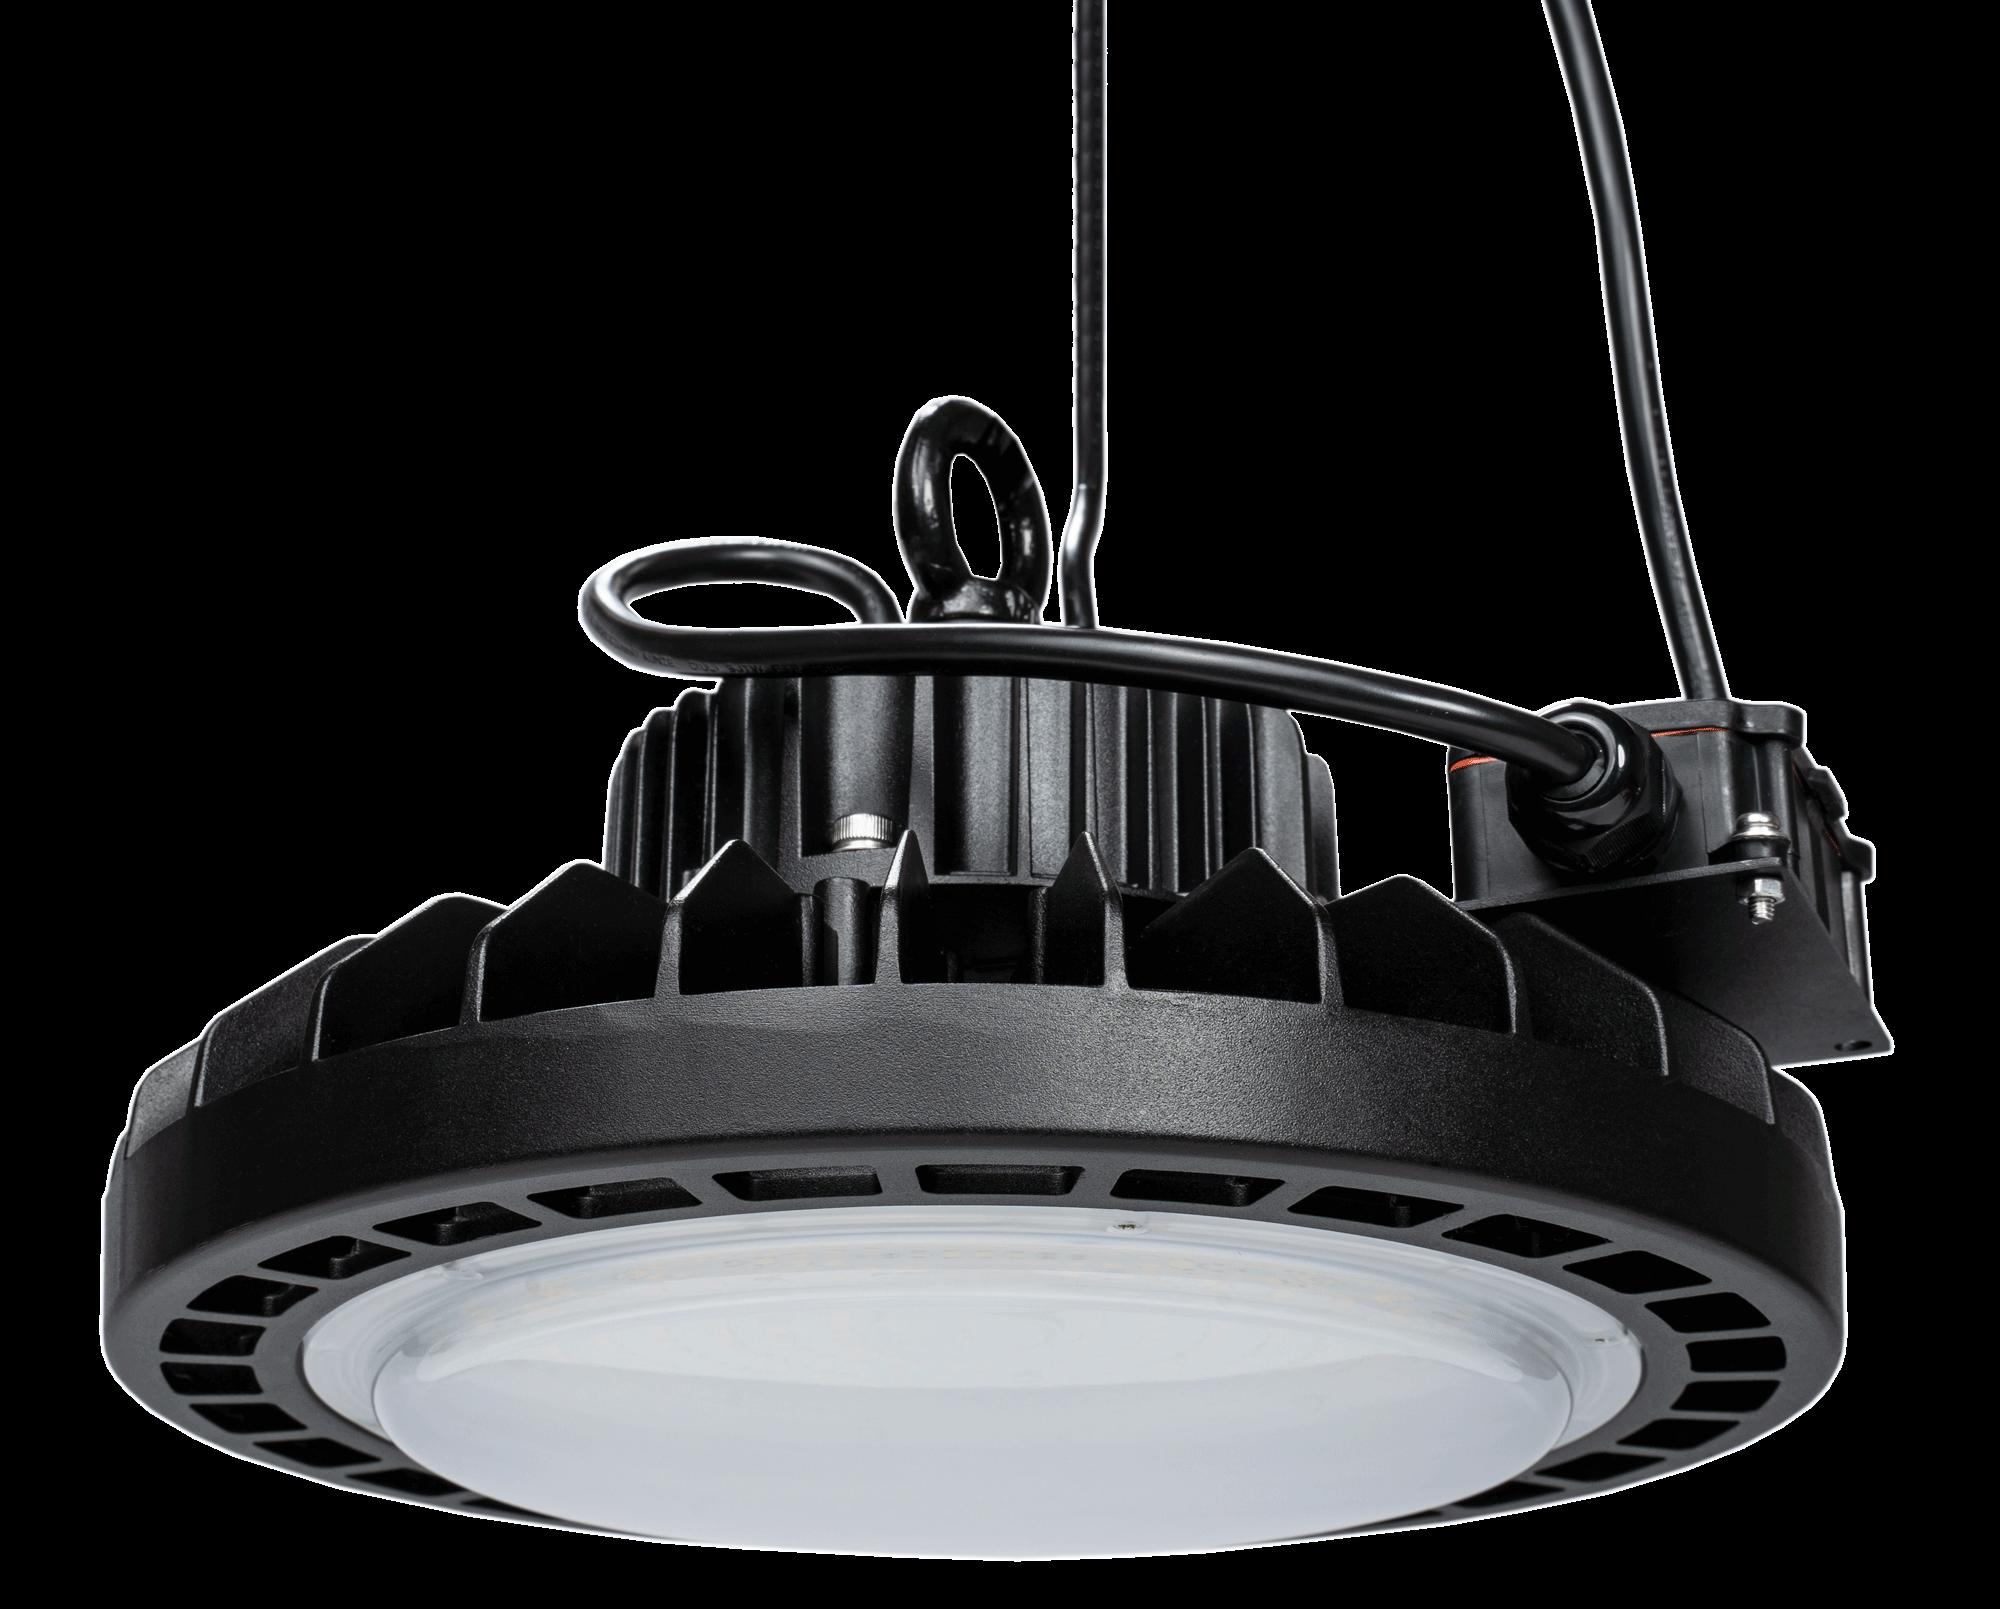 Vapor Tight LED High Bay Light Fixture